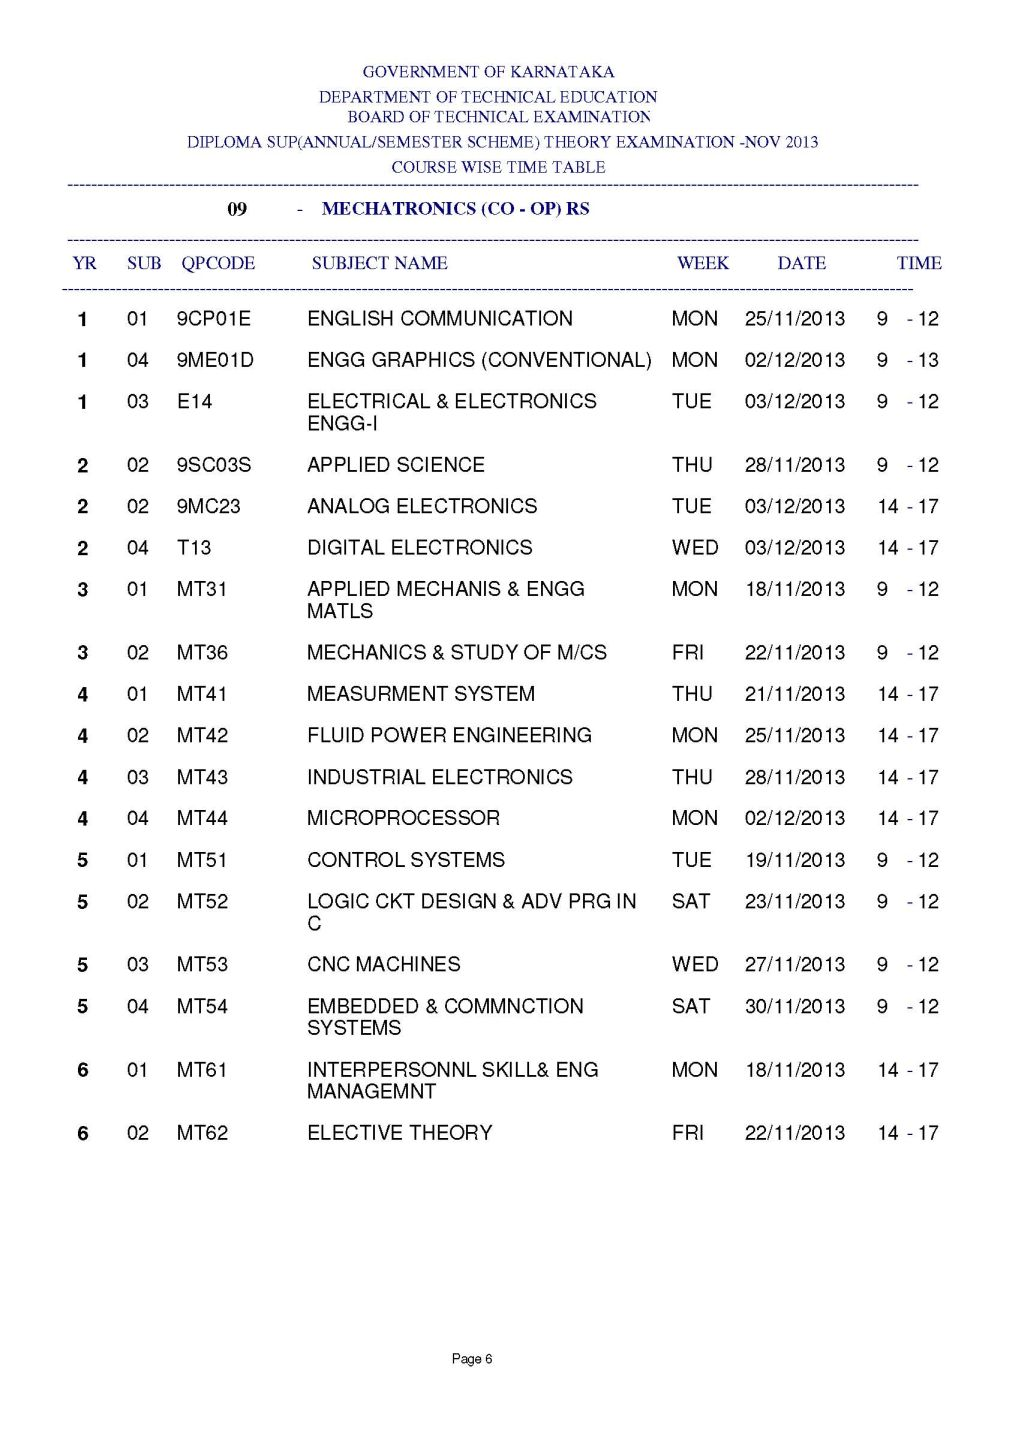 Zica Exam Time Table Dec 2013 2015 | Personal Blog